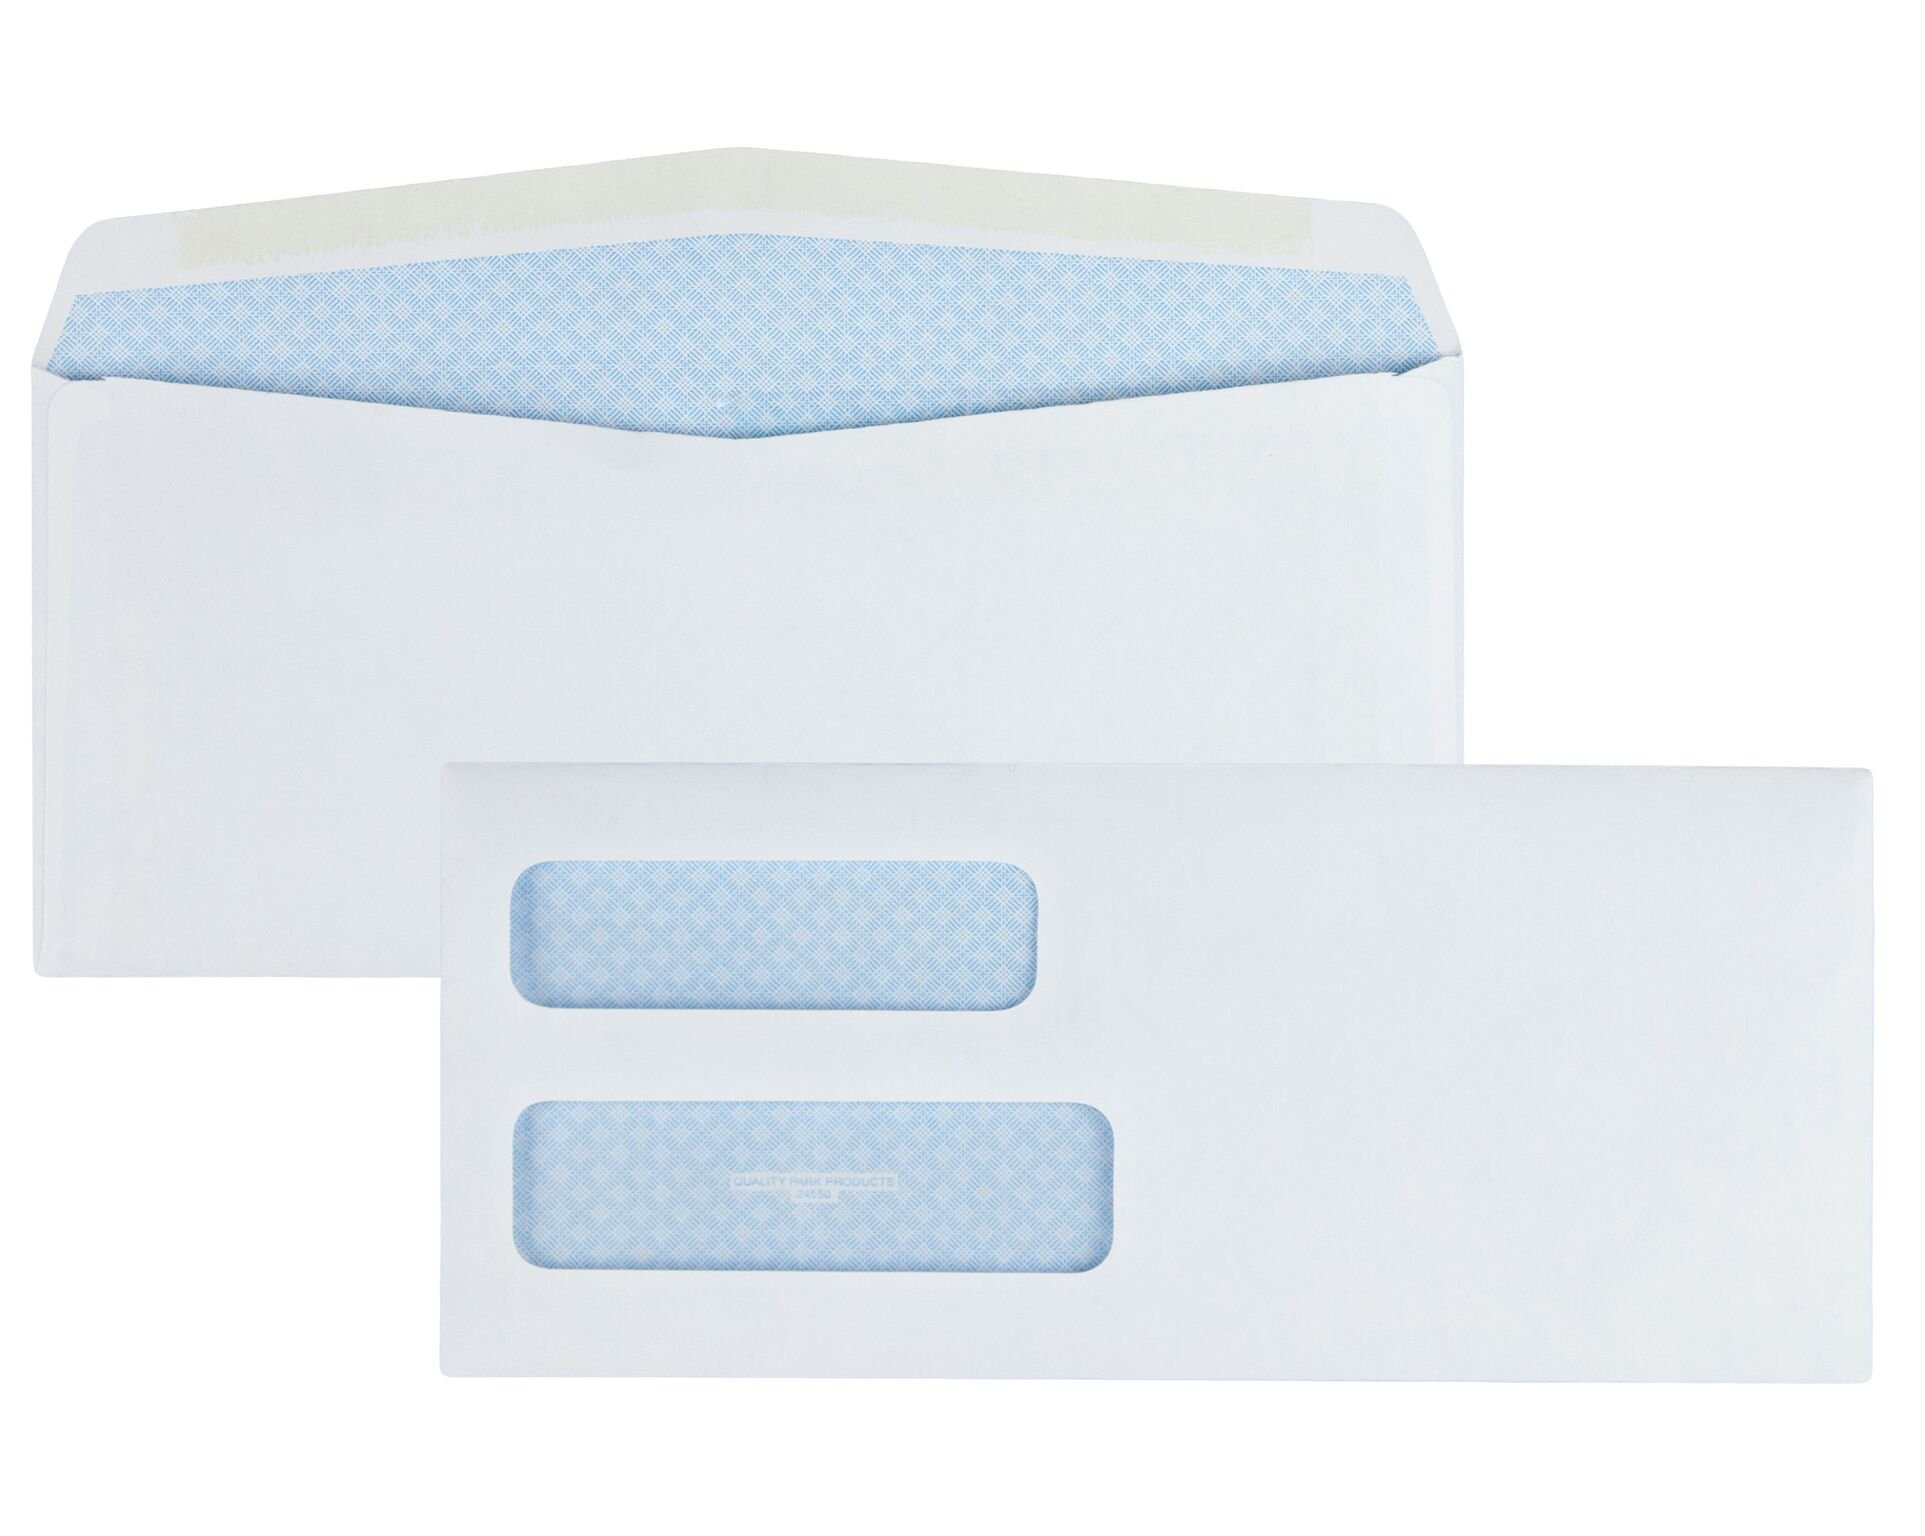 Quality Park #10 Double Window Envelope, Regular Gum, 500 Envelopes (24550)